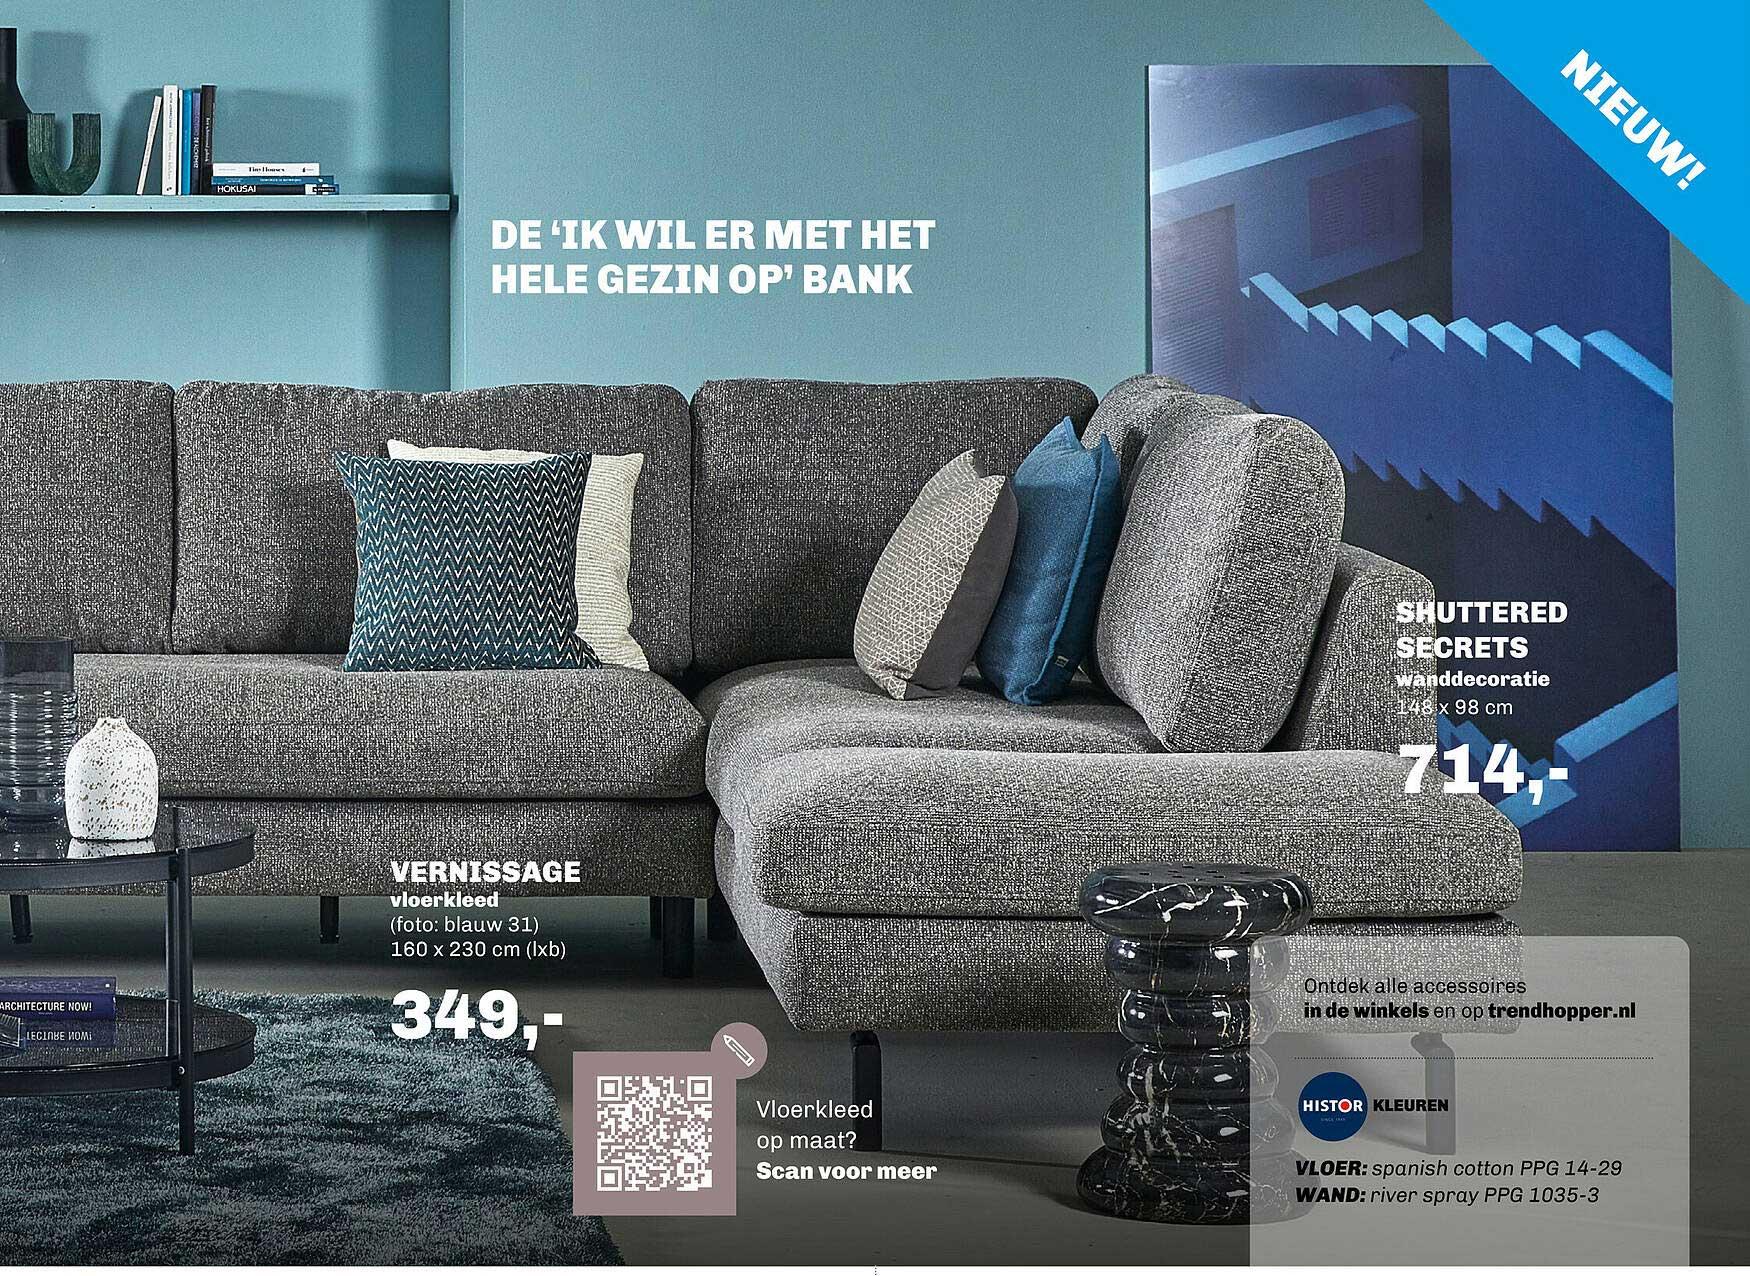 Trendhopper Vernissage Vloerkleed 160 X 230 Cm Of Shuttered Secrets Wanddecoratie 148 X 98 Cm